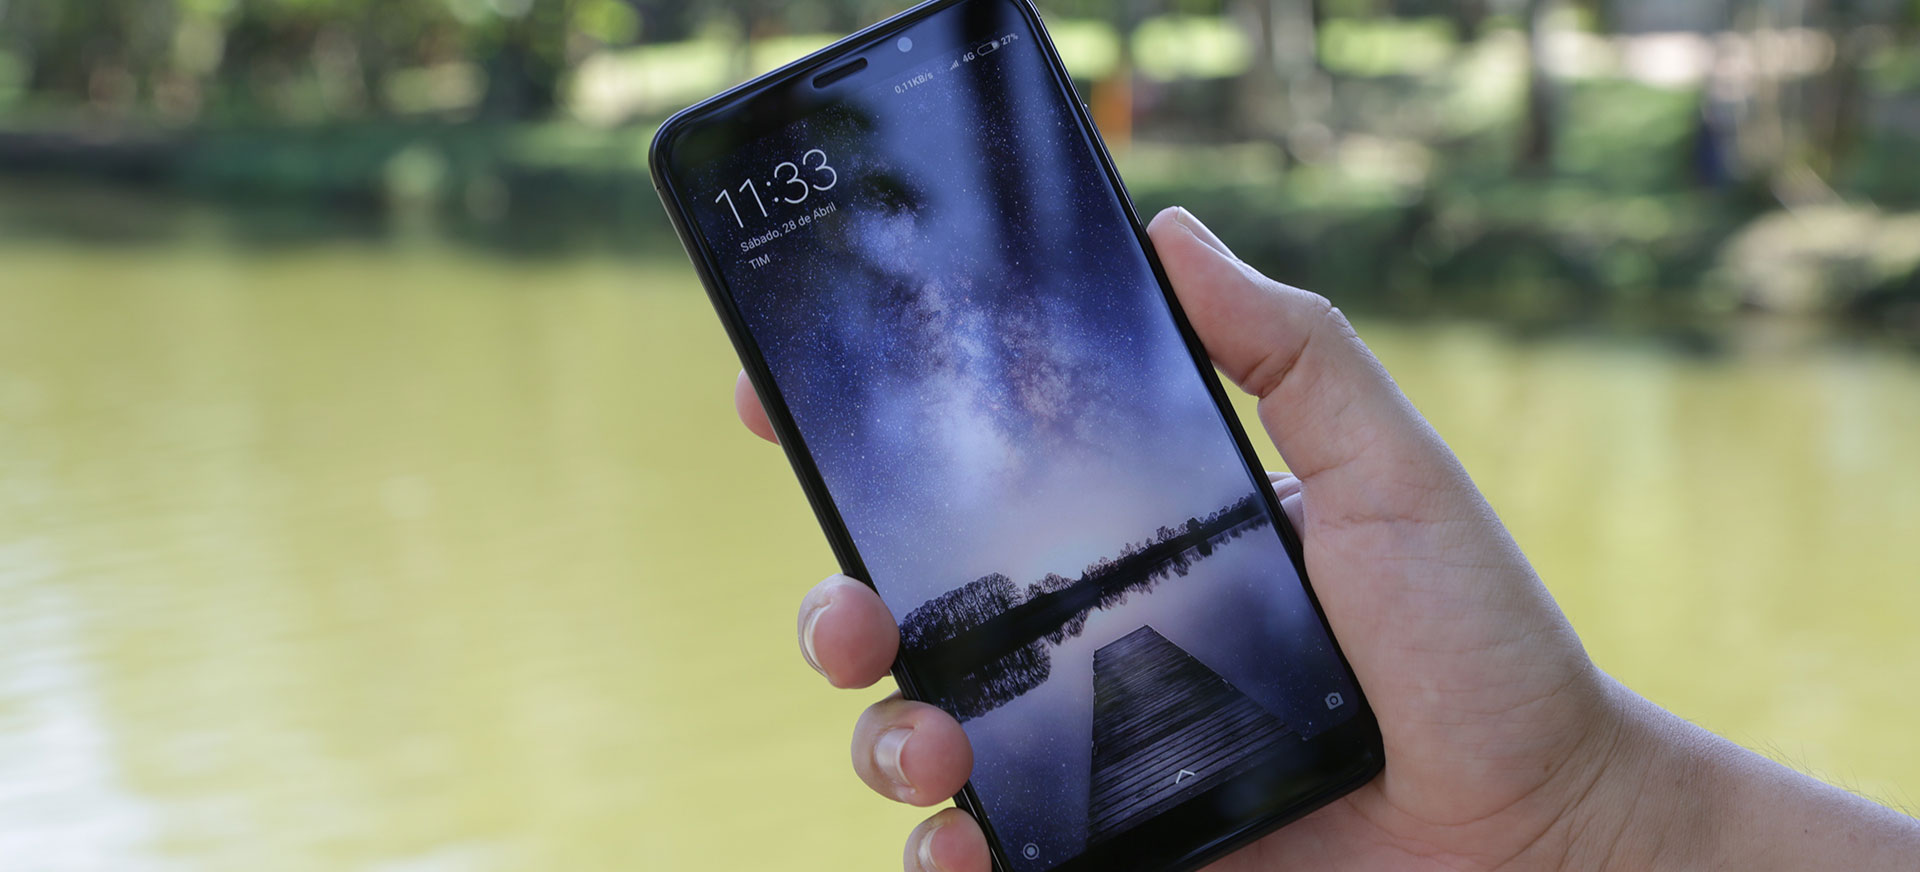 Anlise Xiaomi Redmi 5 Plus Mundo Conectado 3gb 32gb Black